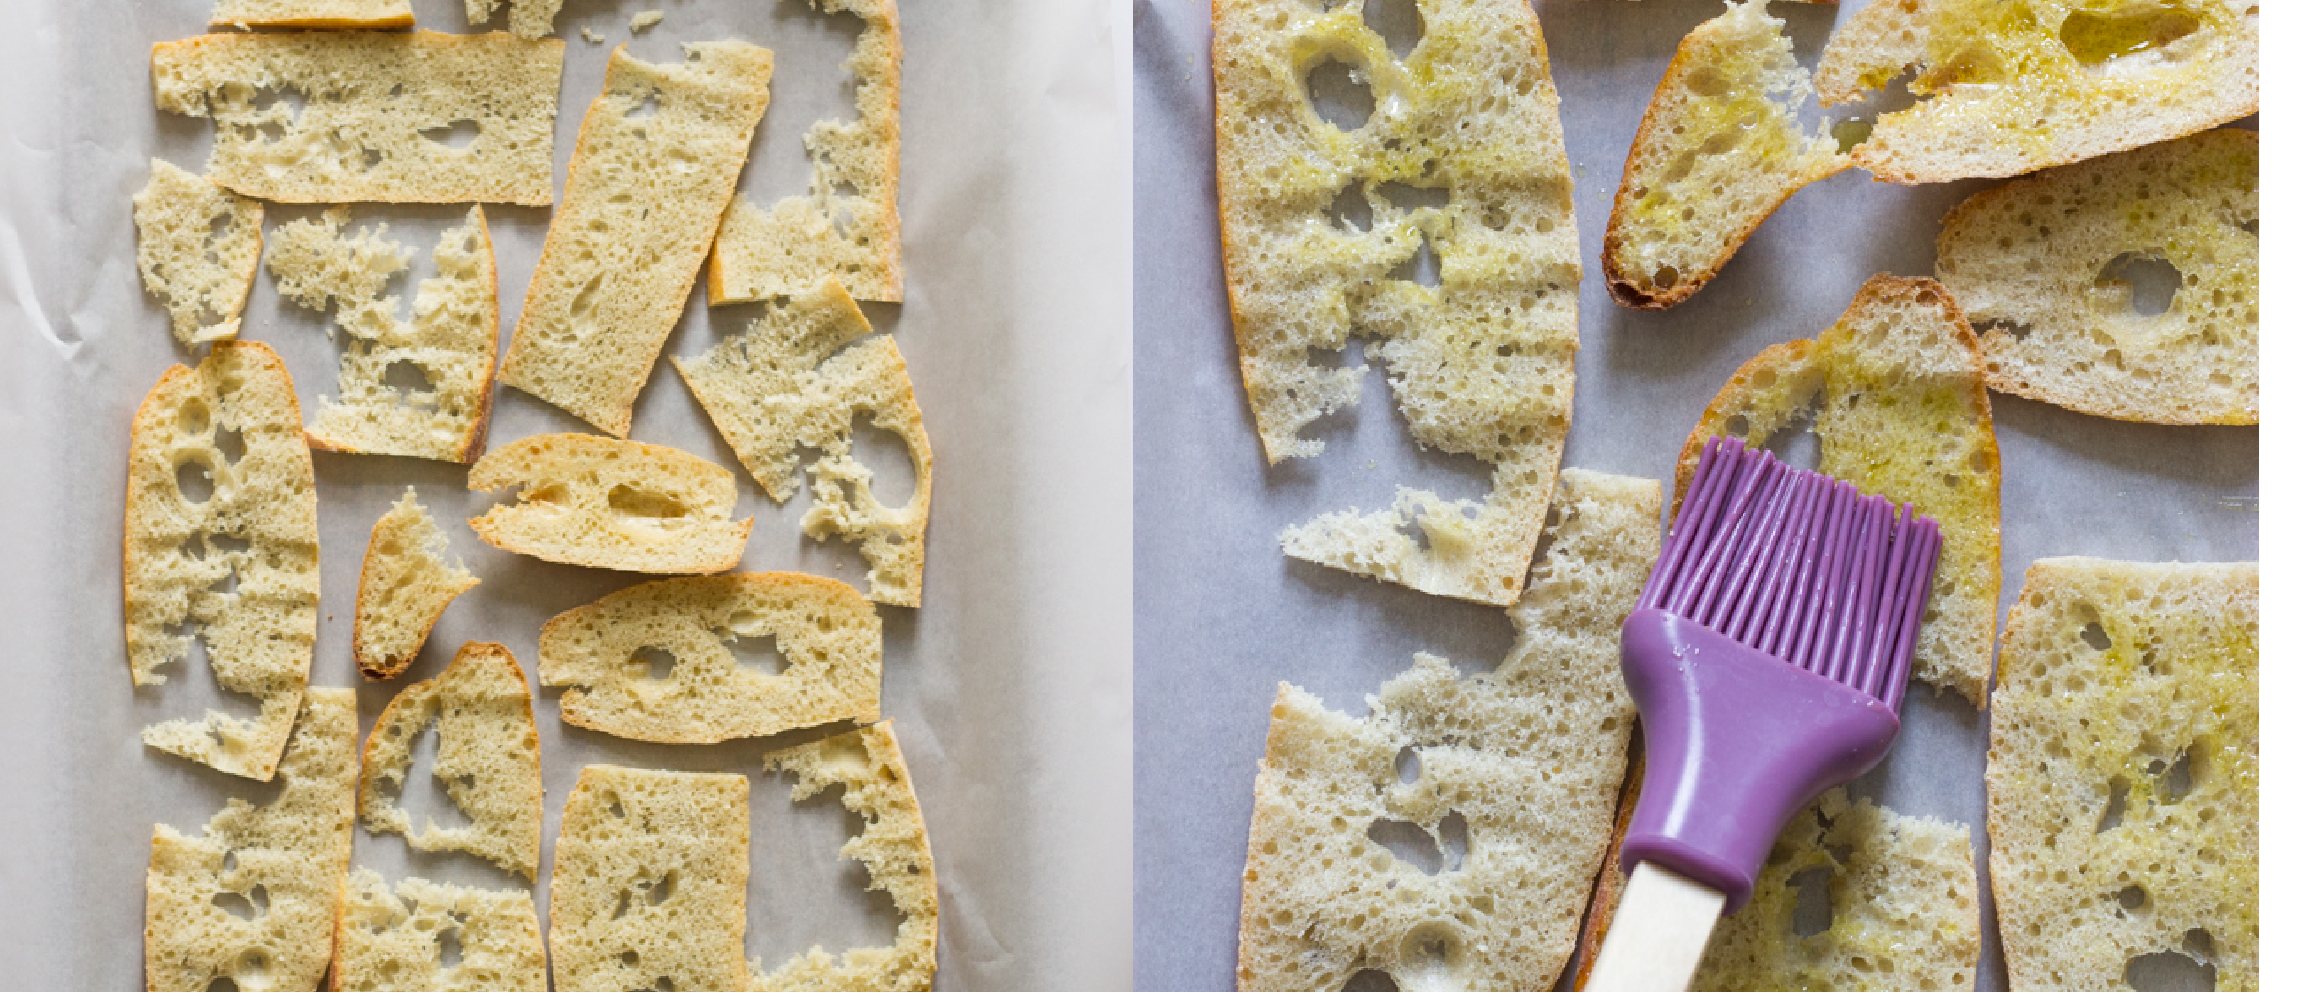 baguette slices on a baking sheet